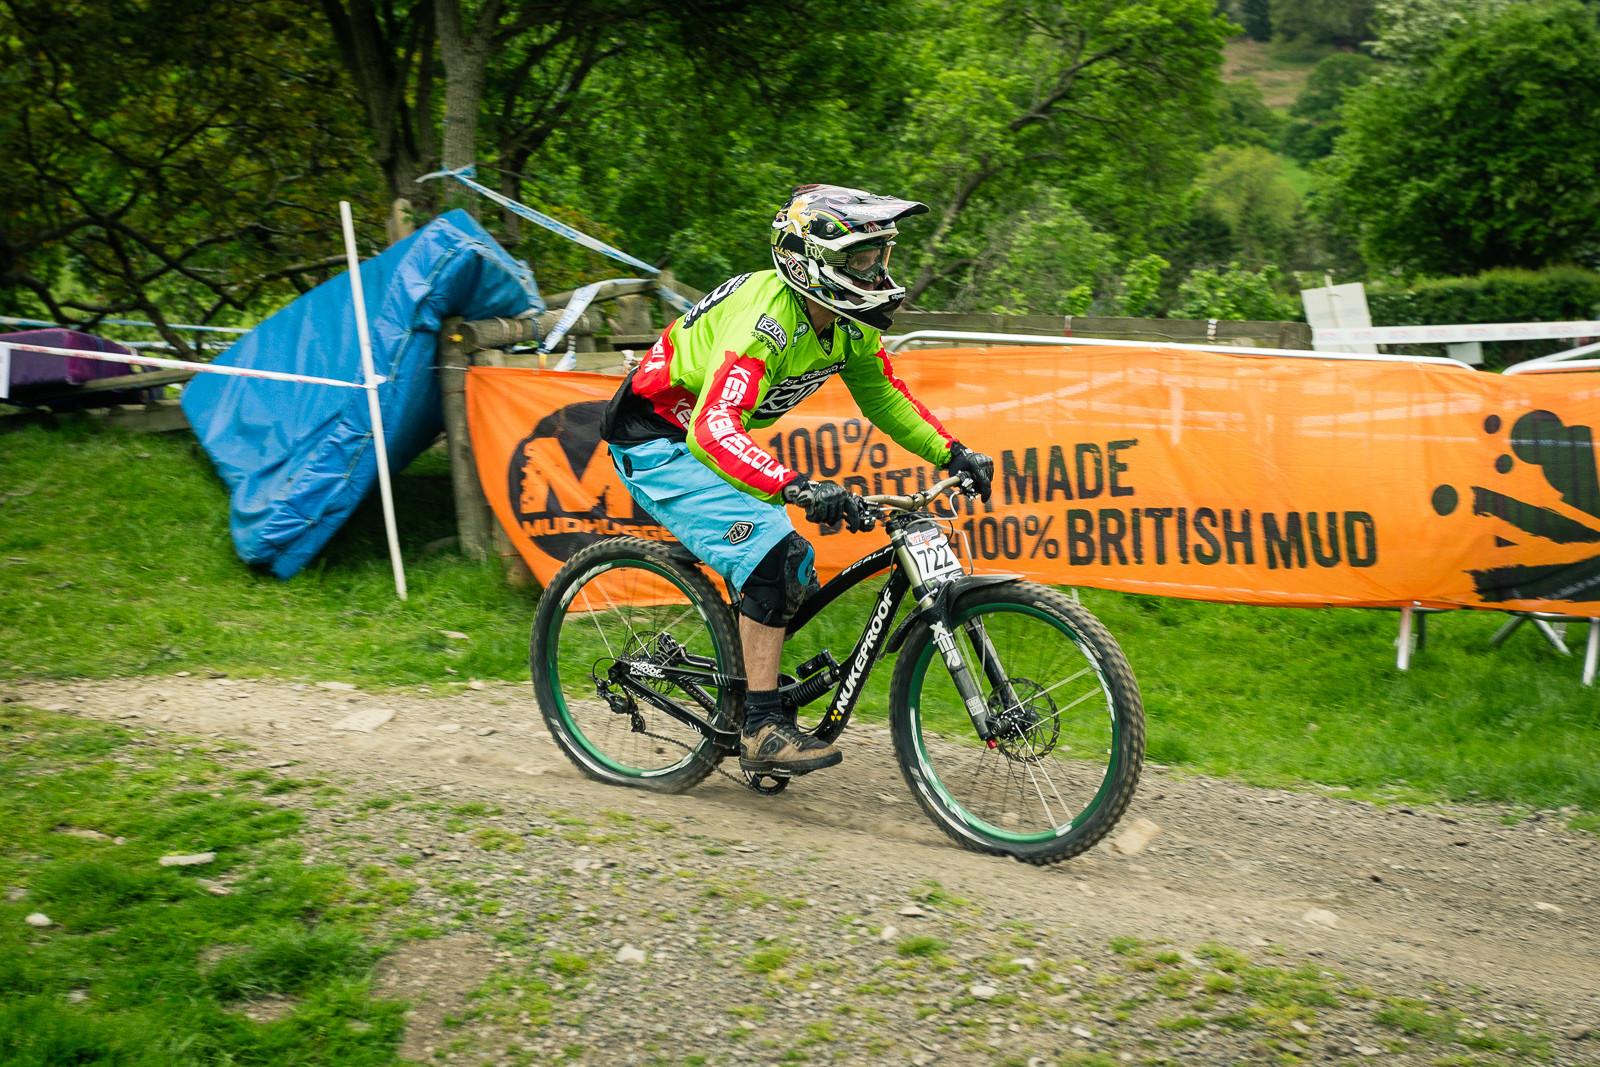 Nukeproof Scalp G-ed Out at Llangollen - G-Out Project - Llangollen BDS 2015 - Mountain Biking Pictures - Vital MTB